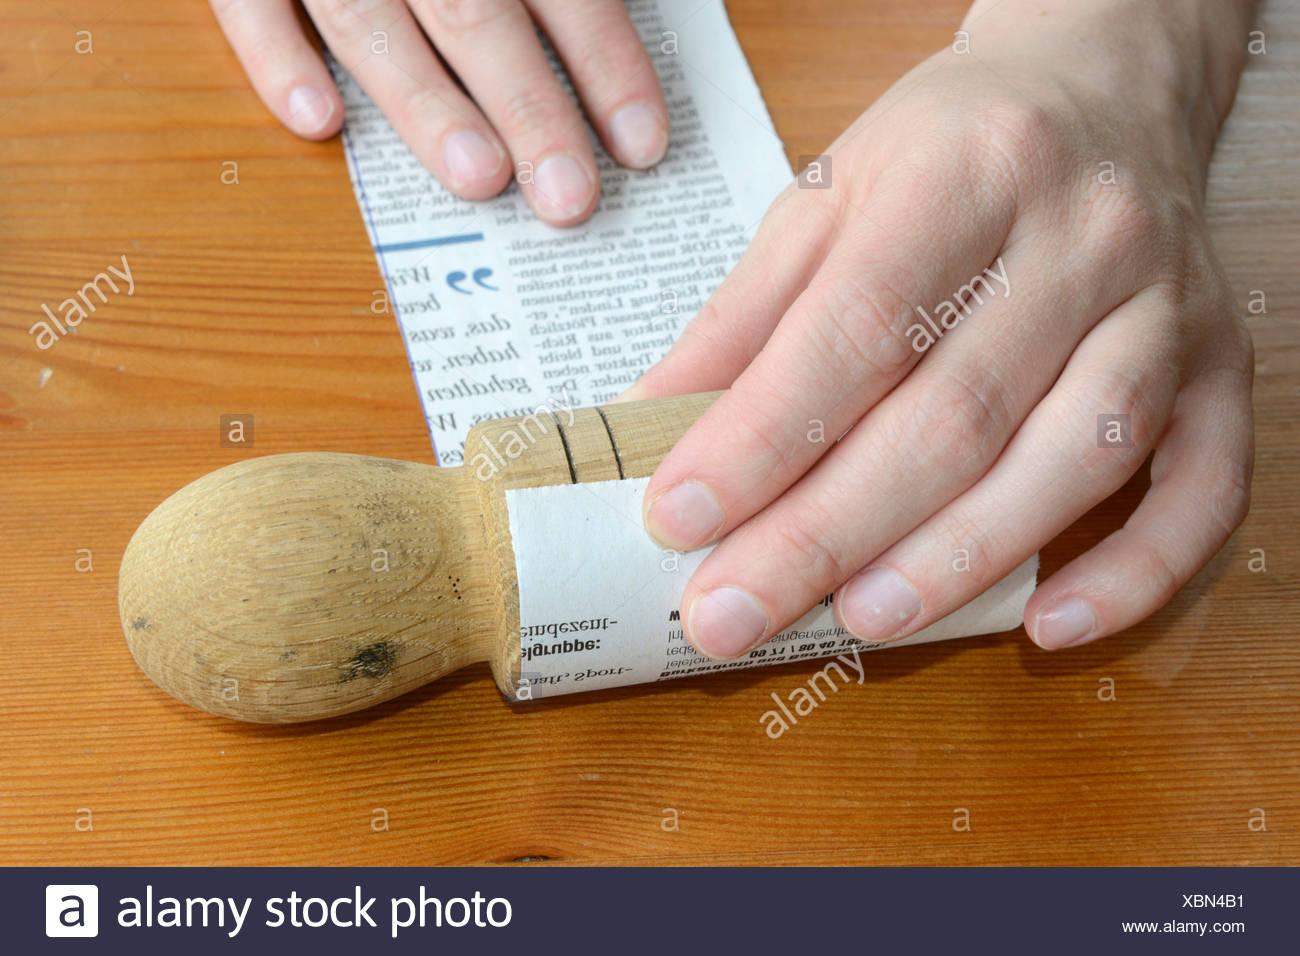 Making paper pot - Stock Image